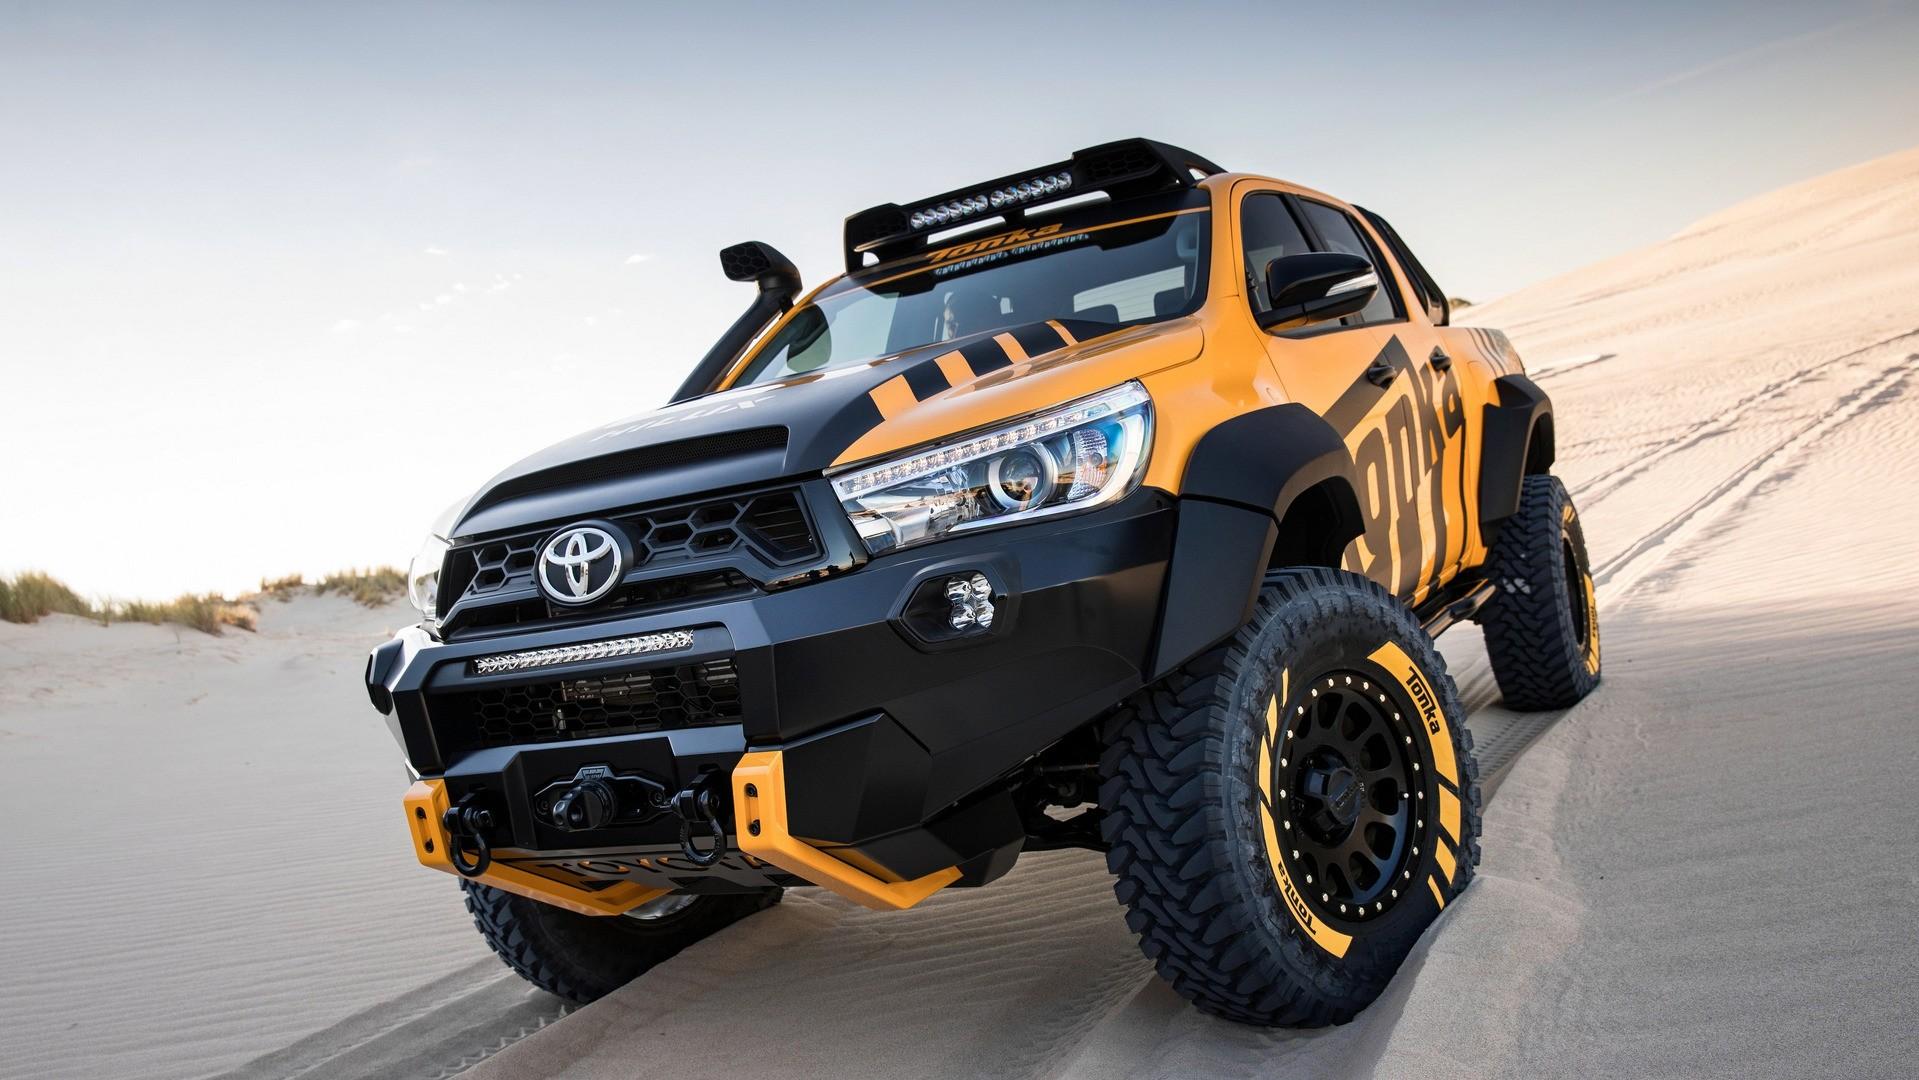 Modifikasi Kolaborasi Toyota Dan Tonka Blackxperiencecom